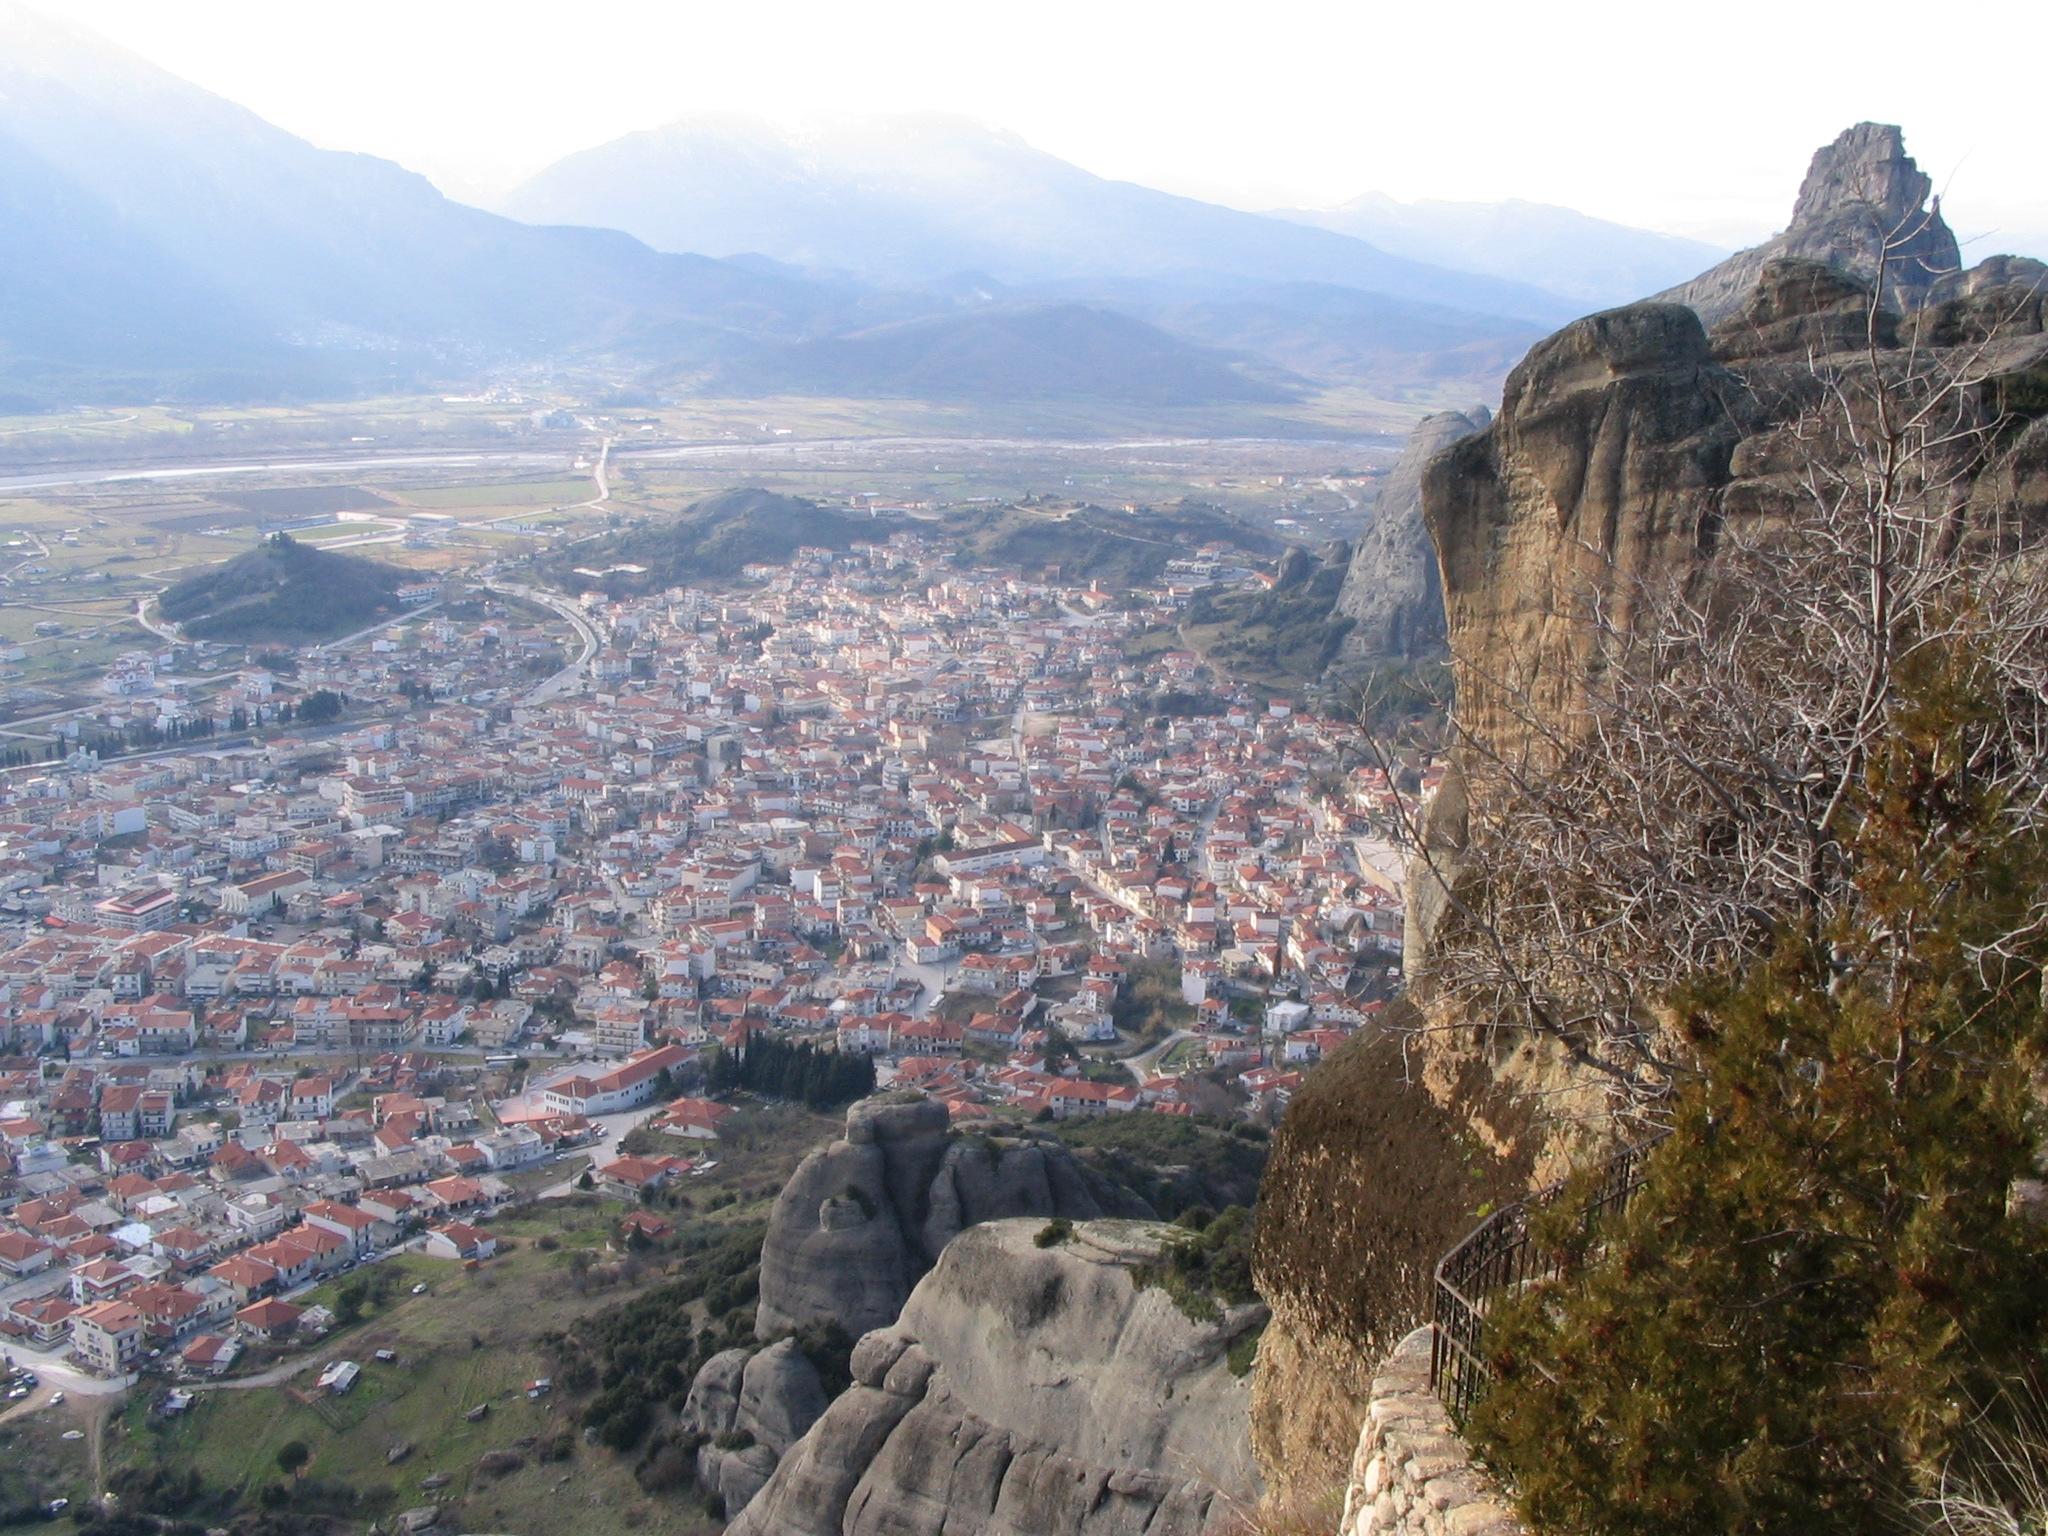 File:Kalambaka from Meteora.jpg - Wikimedia Commons